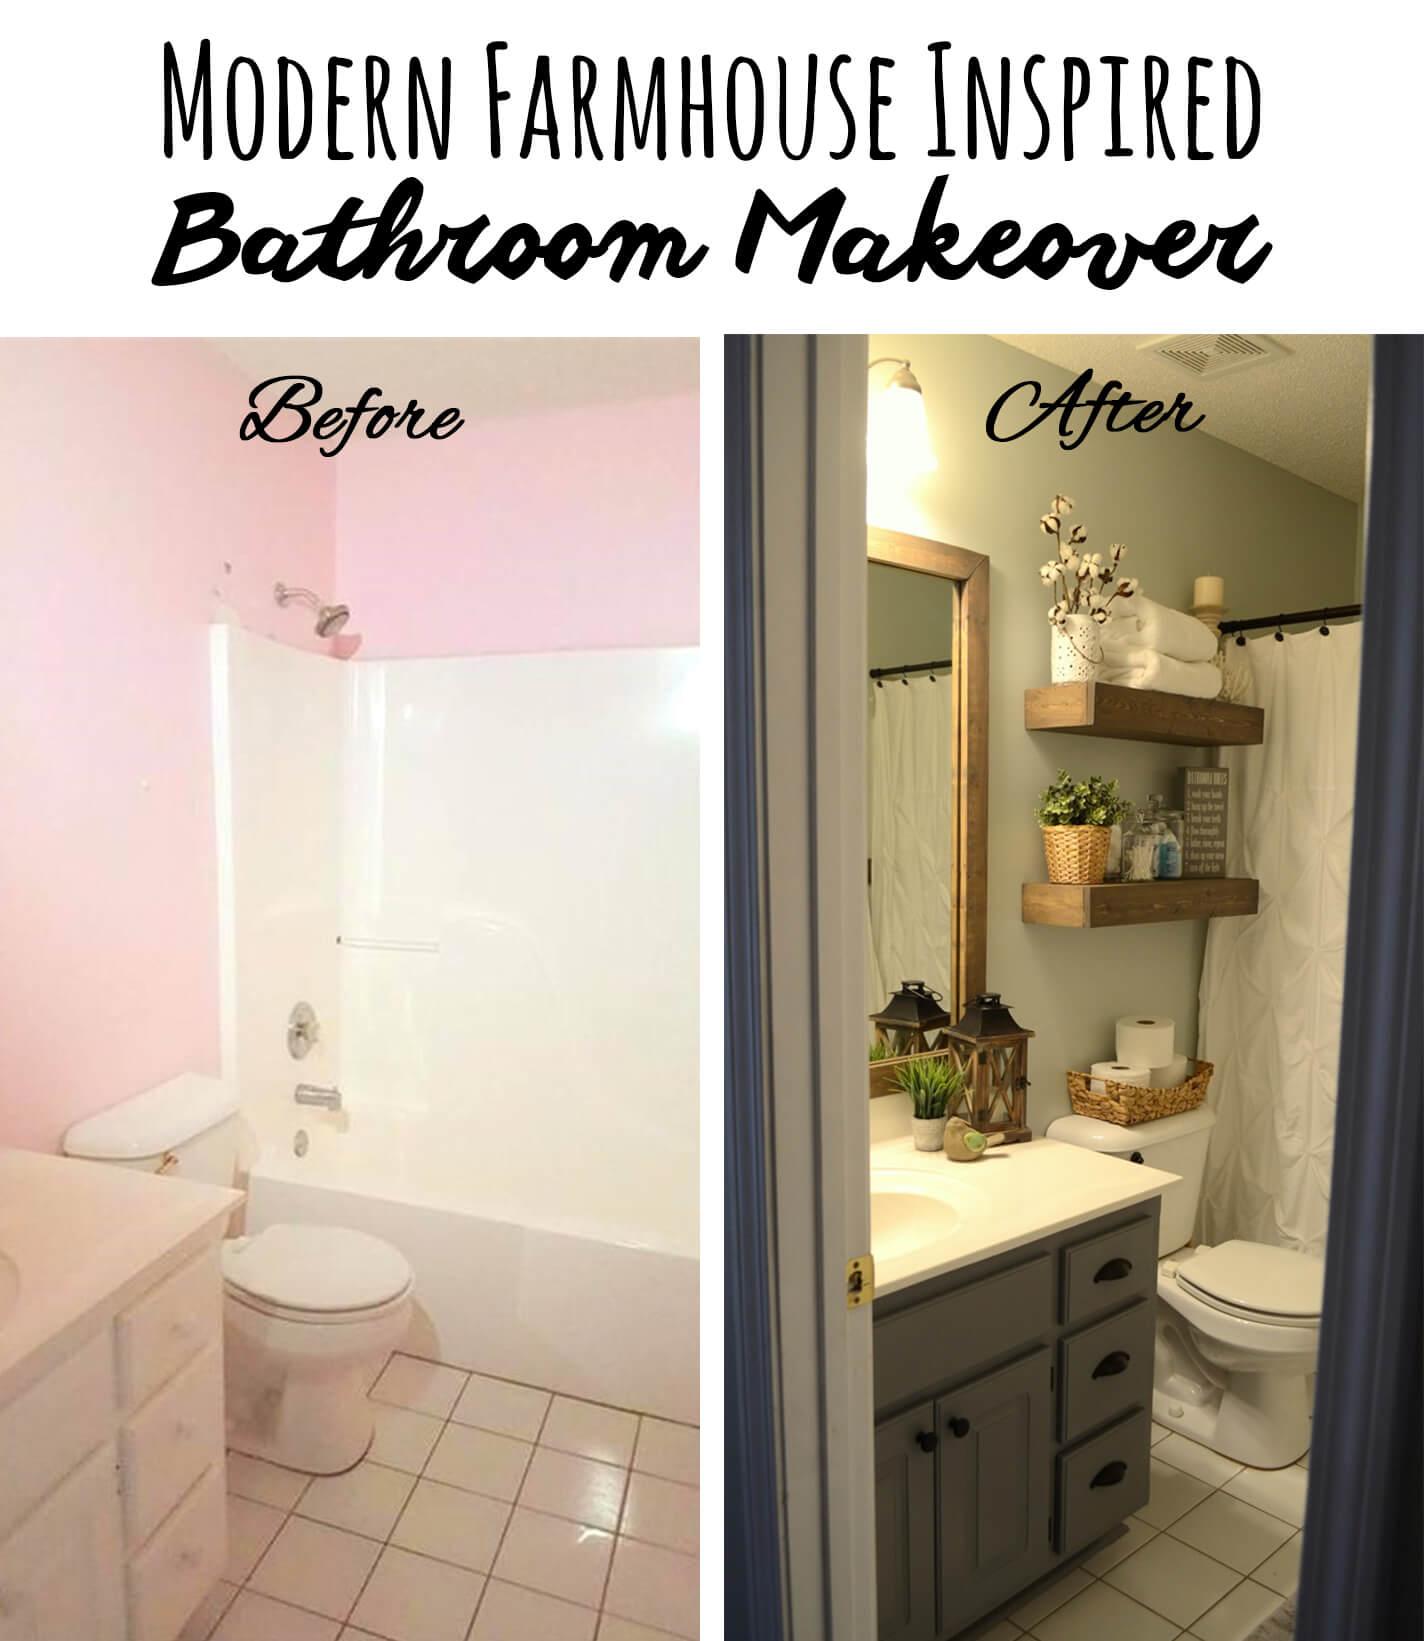 28 Best Budget Friendly Bathroom Makeover Ideas and ... on Bathroom Ideas On A Budget  id=52118